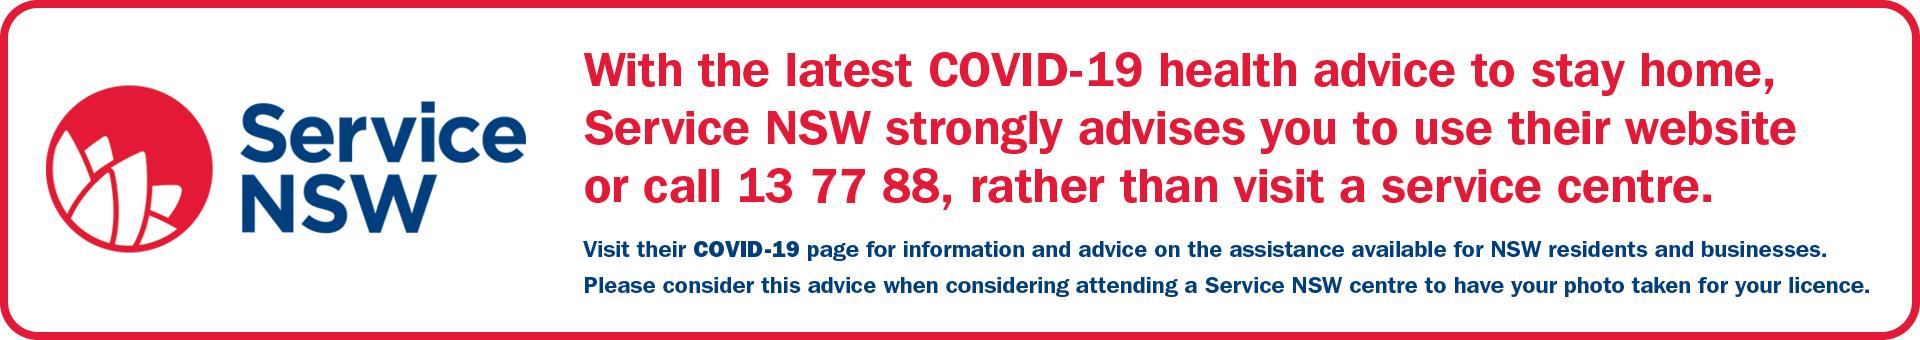 COVID-19 - Service NSW.jpg